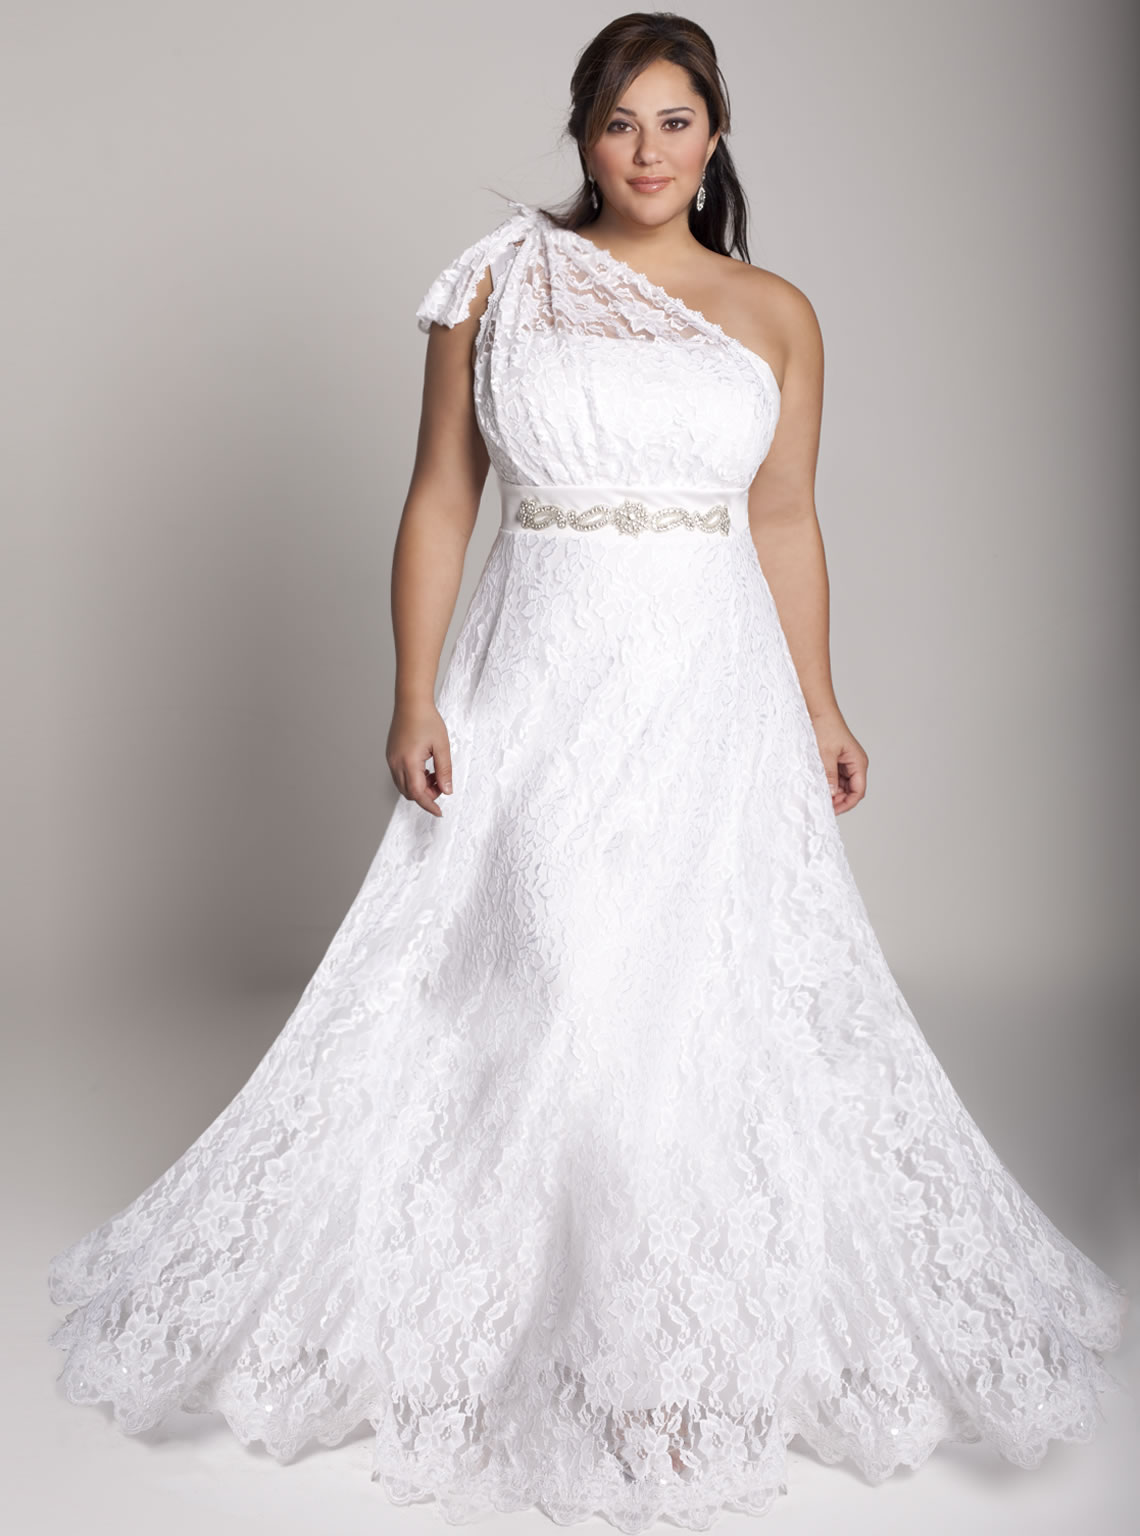 10 charming plus size wedding dresses for curvy girls   plus size